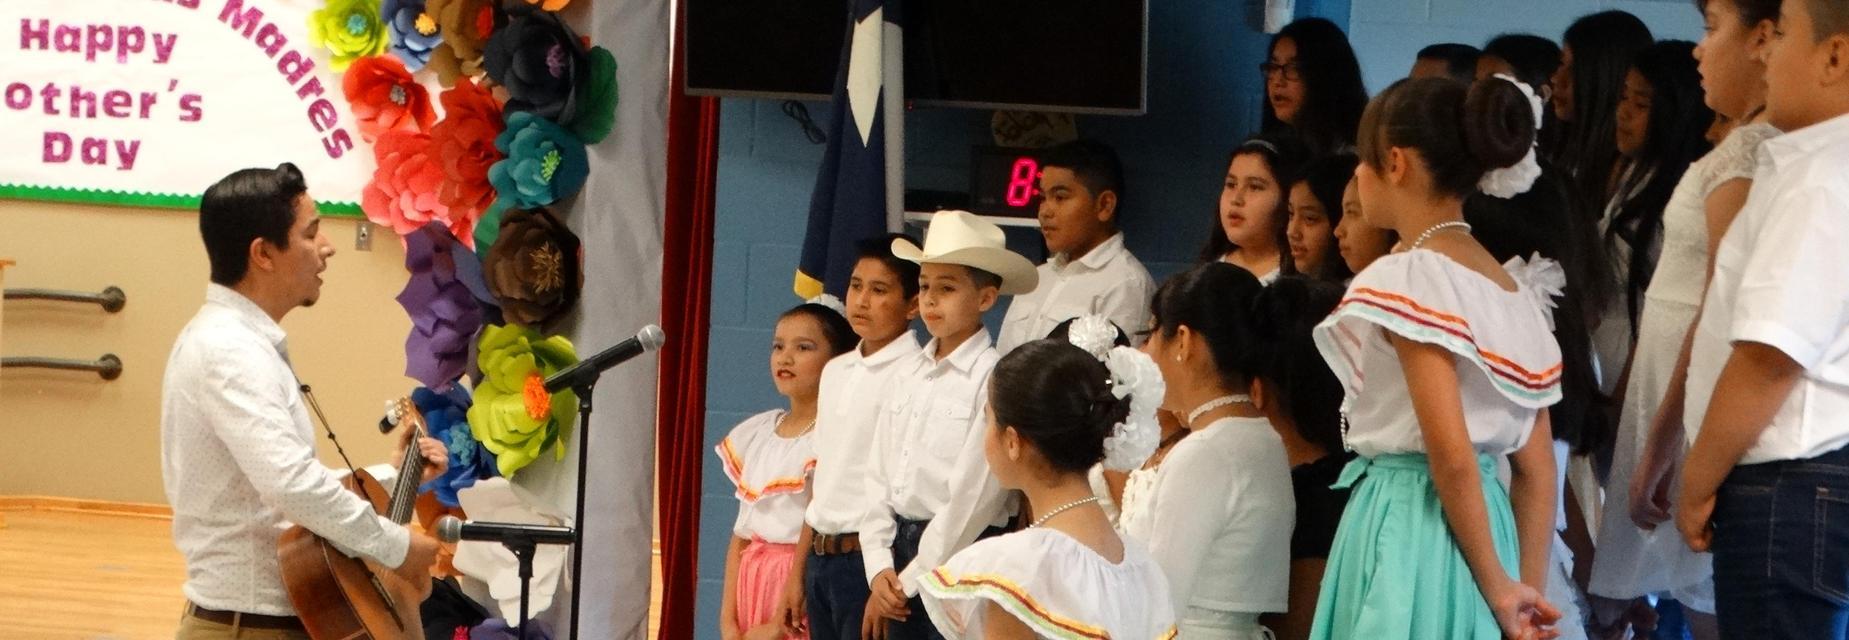 Choir group performing with music teacher